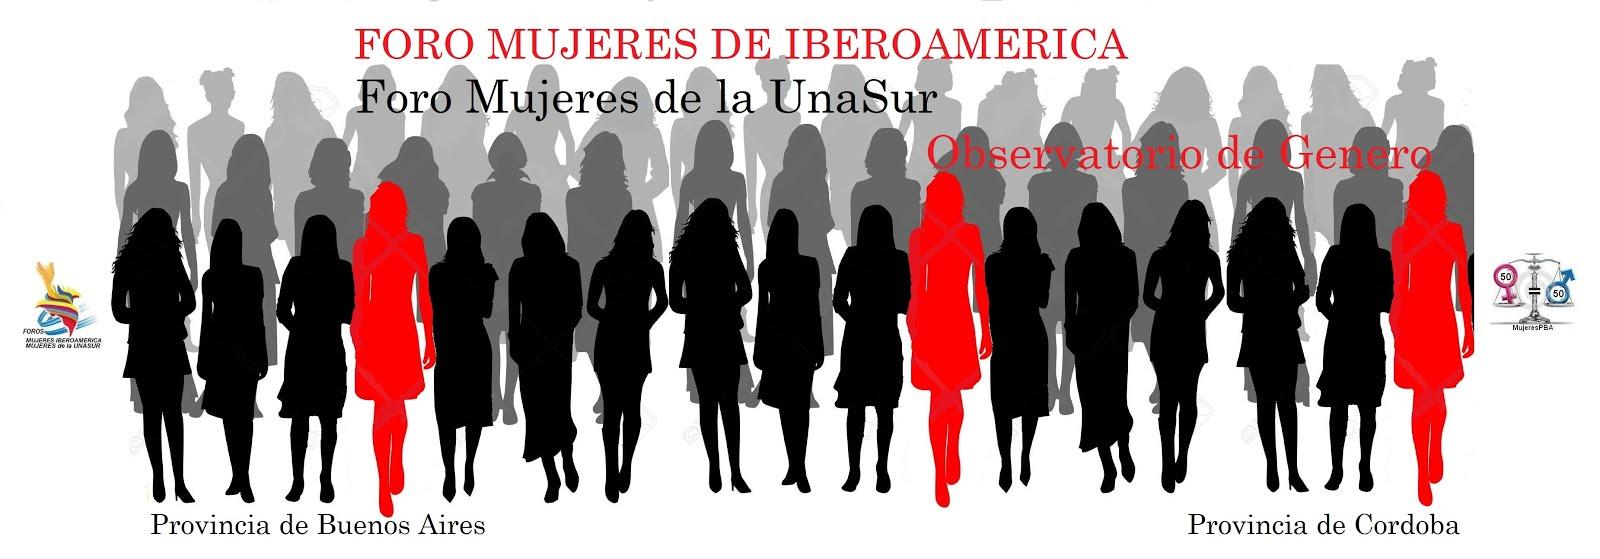 ASC - PBA  -  FORO Mujeres de Iberoamerica  -    FORO Mujeres UnaSur Observatorio de Genero